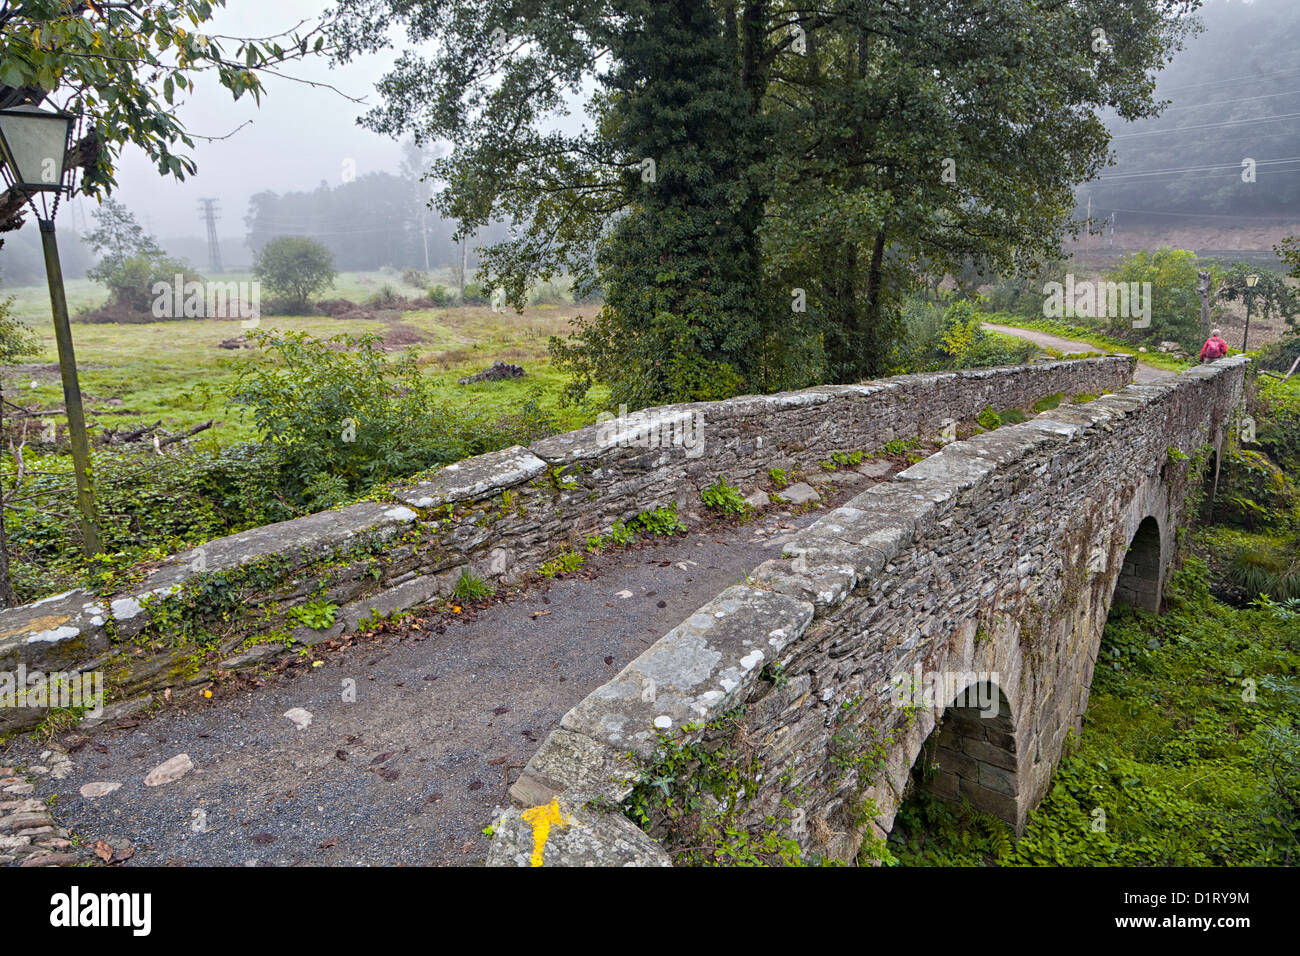 stone pilgrimage bridge Ponte Aspera over Rio Celeiro, Sarria Spain, a painted yellow arrow marks the Camino Way - Stock Image